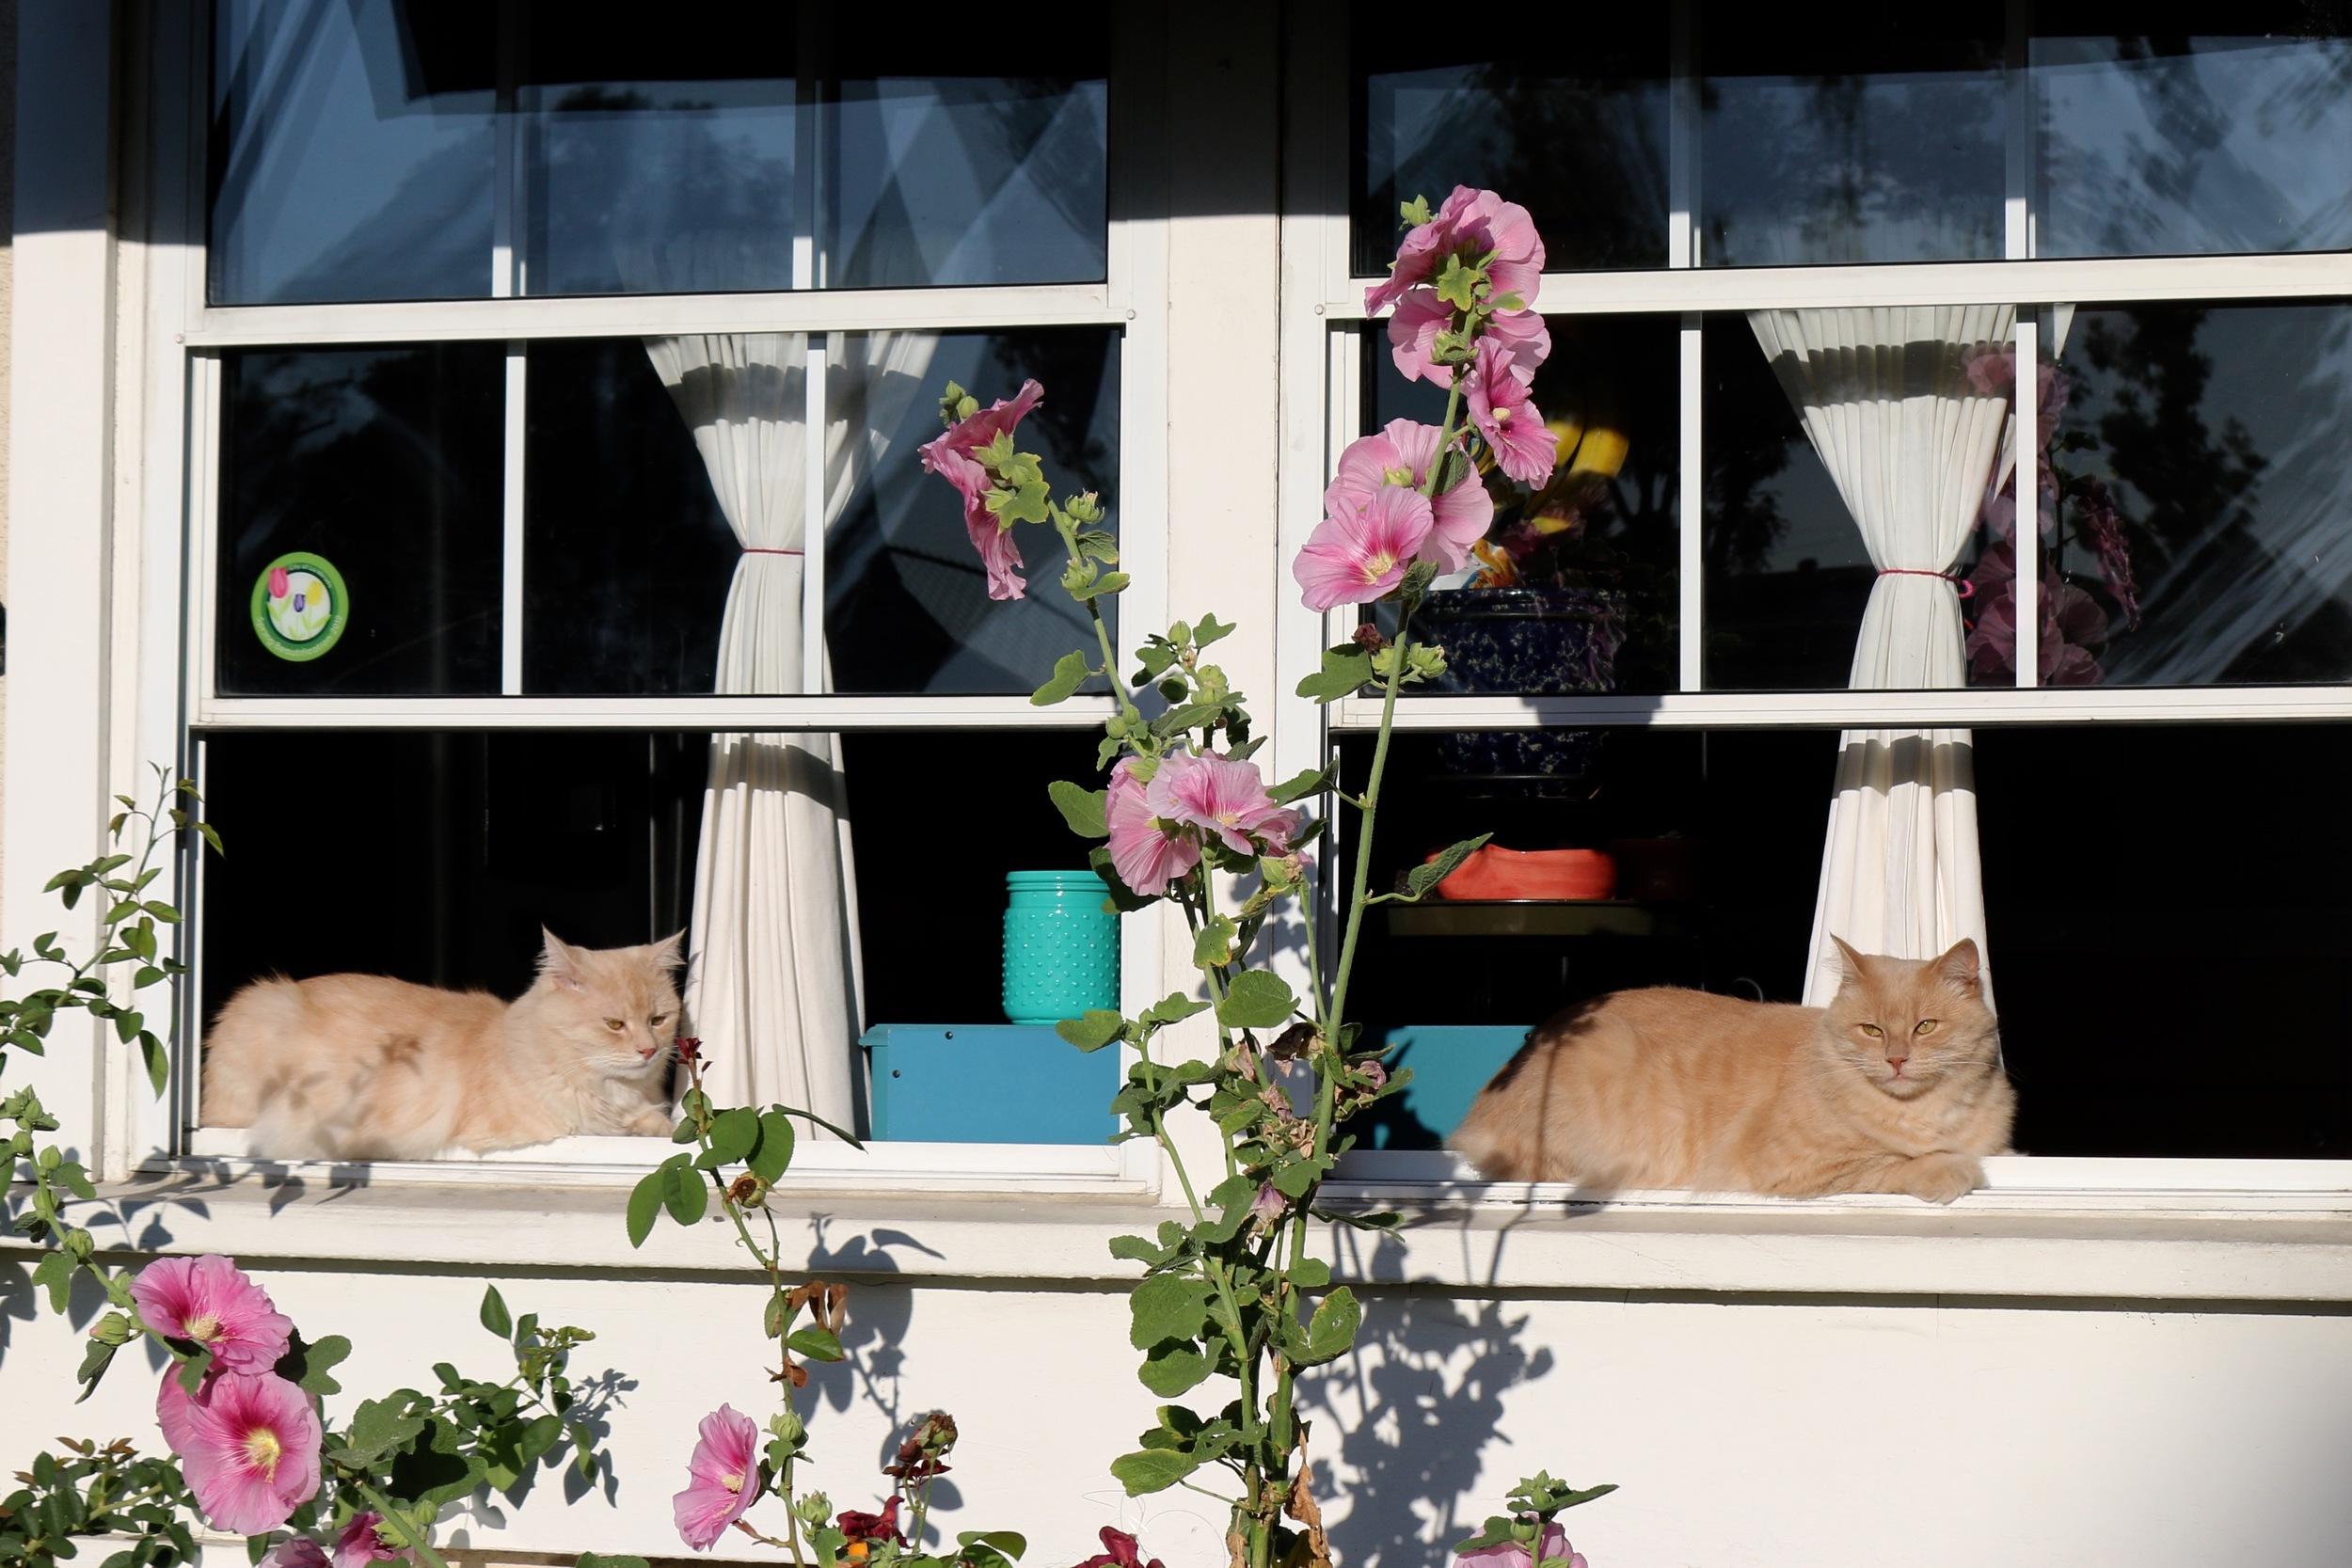 Simon and Garfunkel soaking in the morning light.